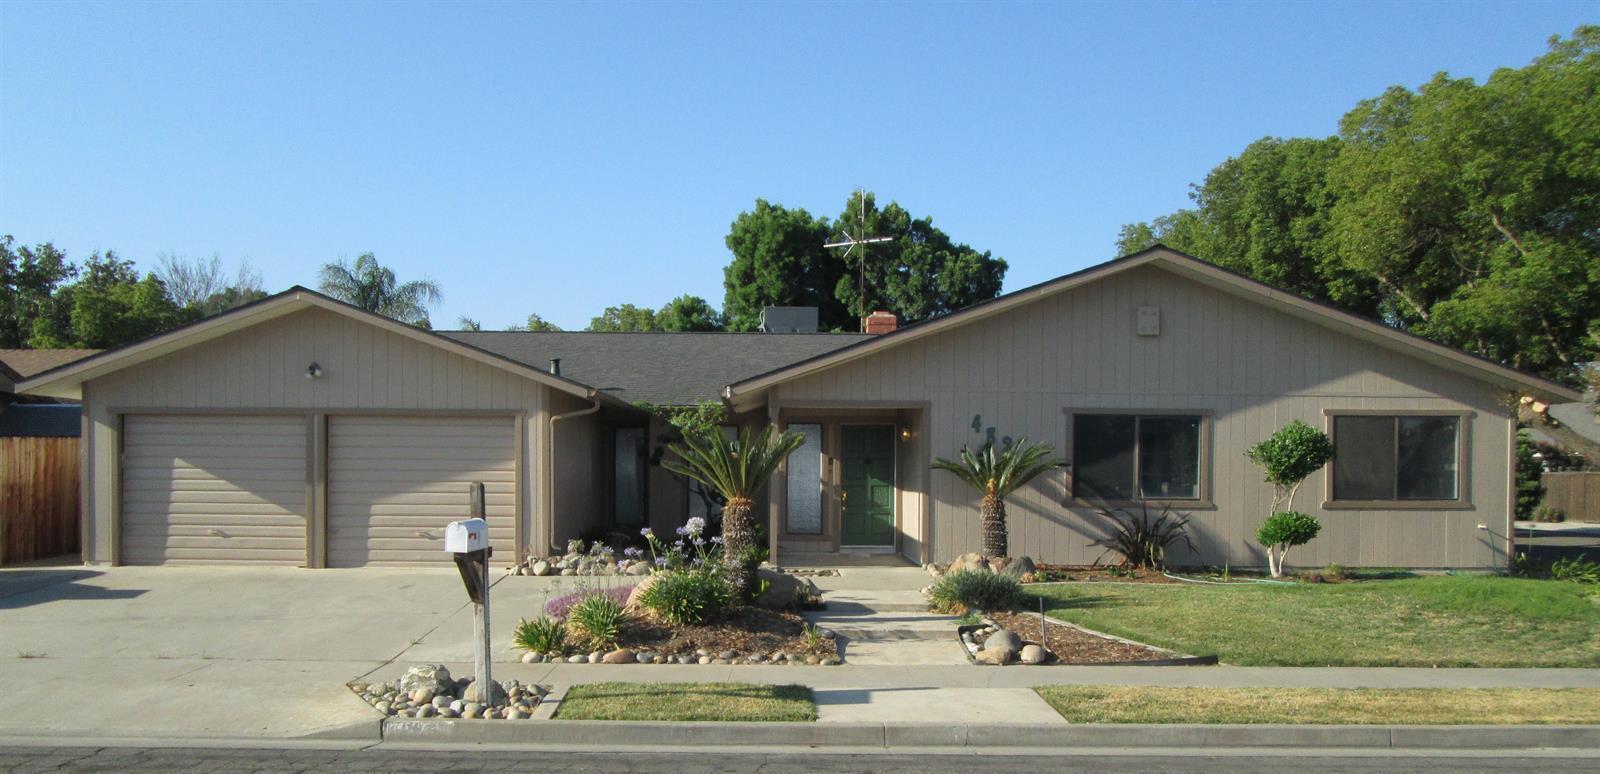 489 W Magnolia Ave, Hanford, CA 93230